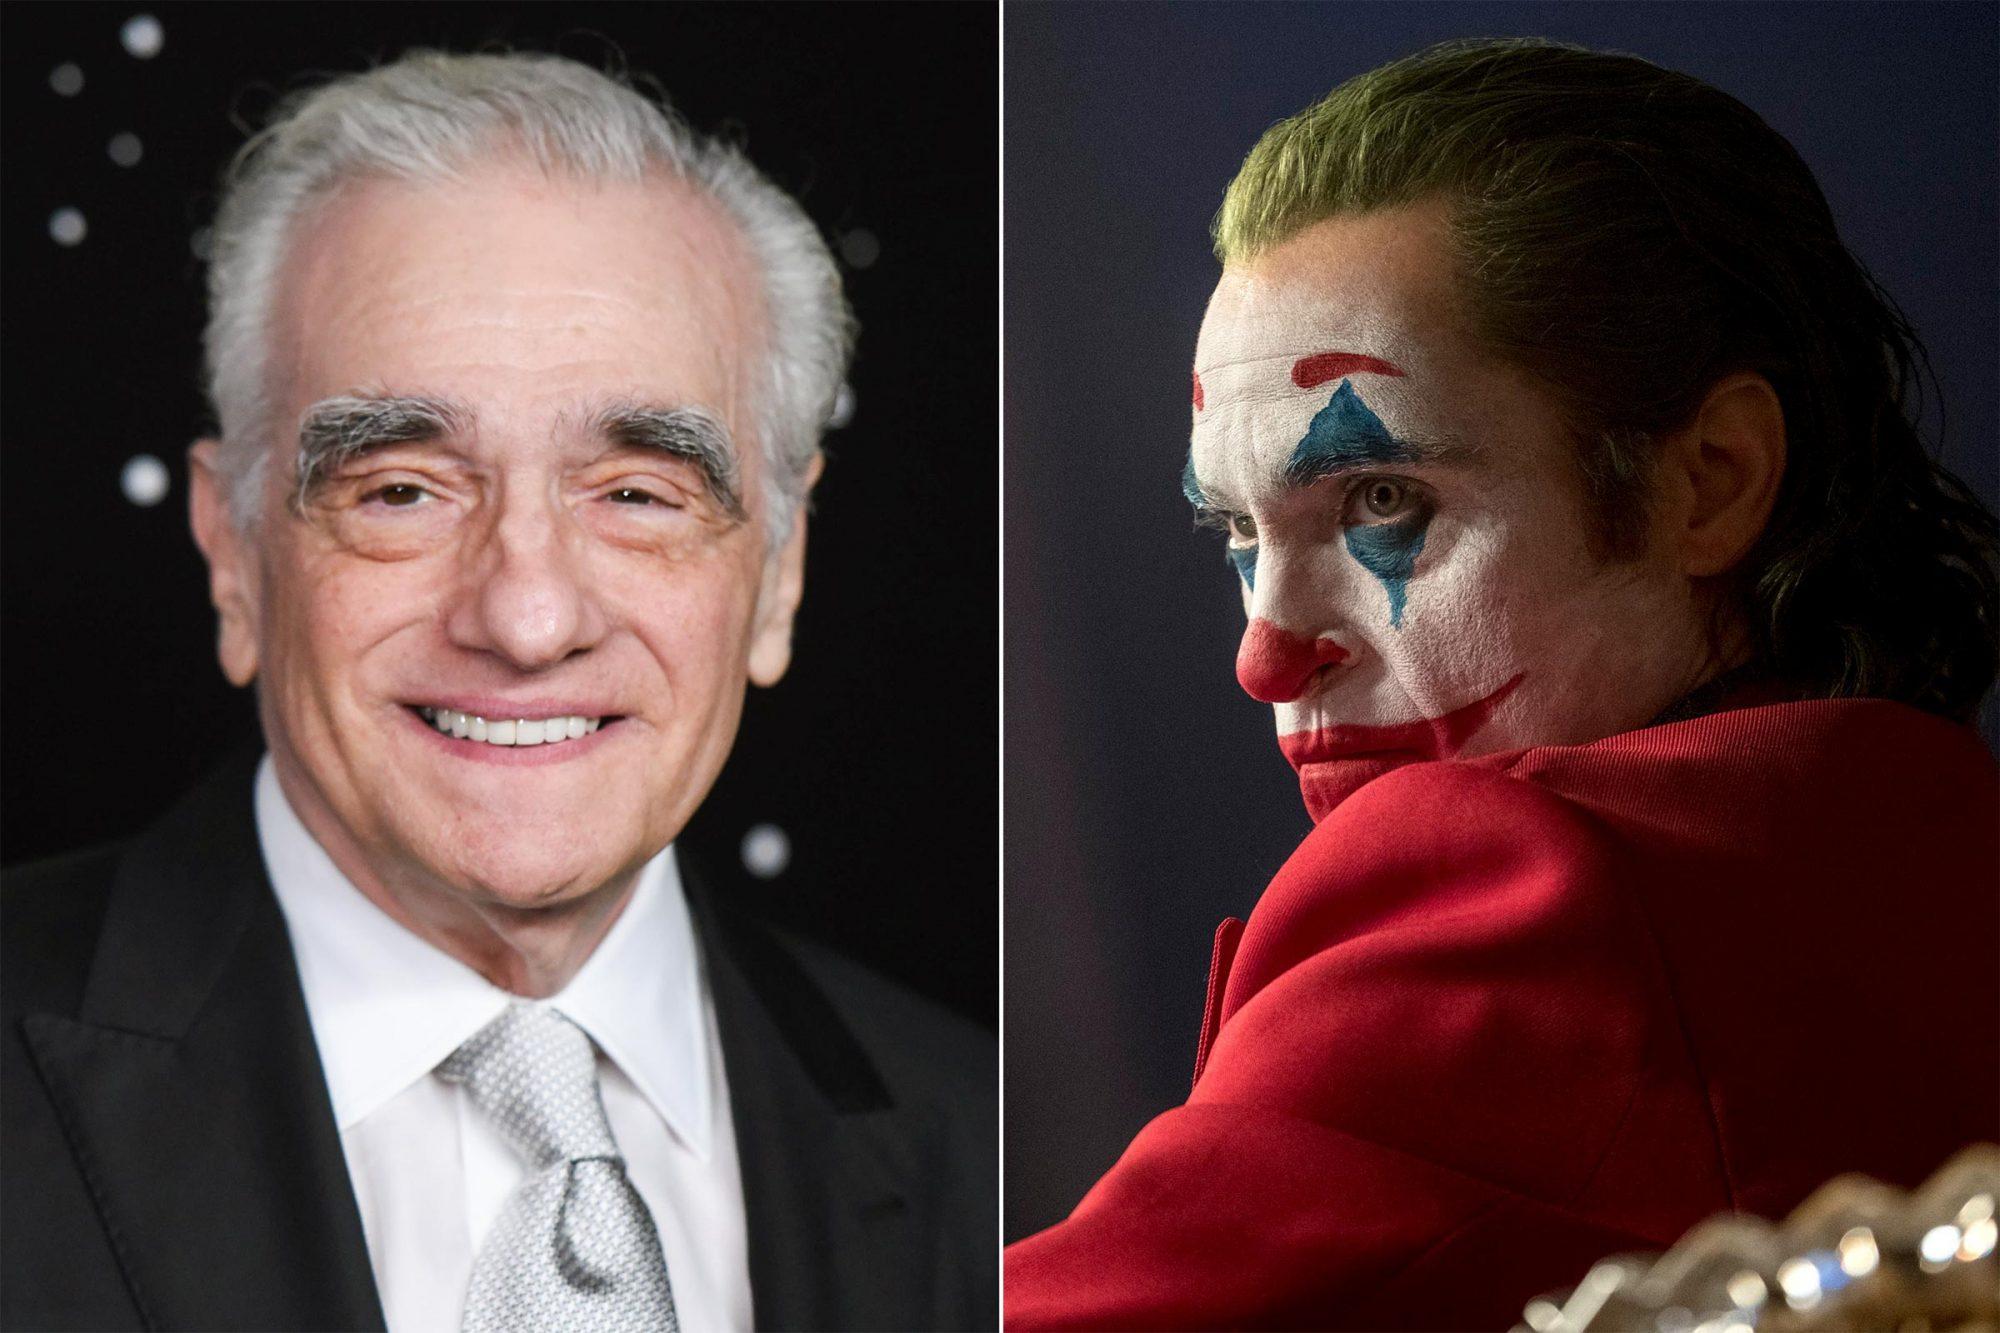 Martin Scorsese / Joker